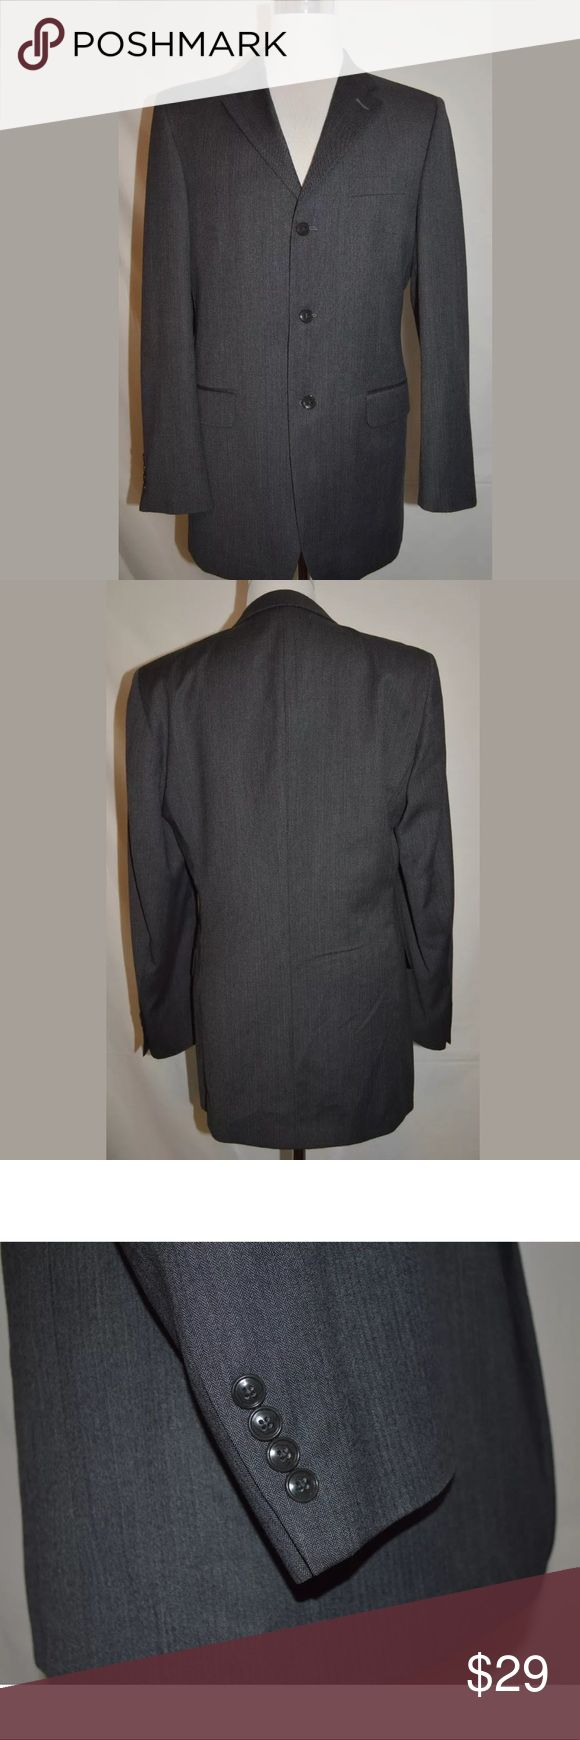 Jones New York Sports Coat Jacket Men's 40L